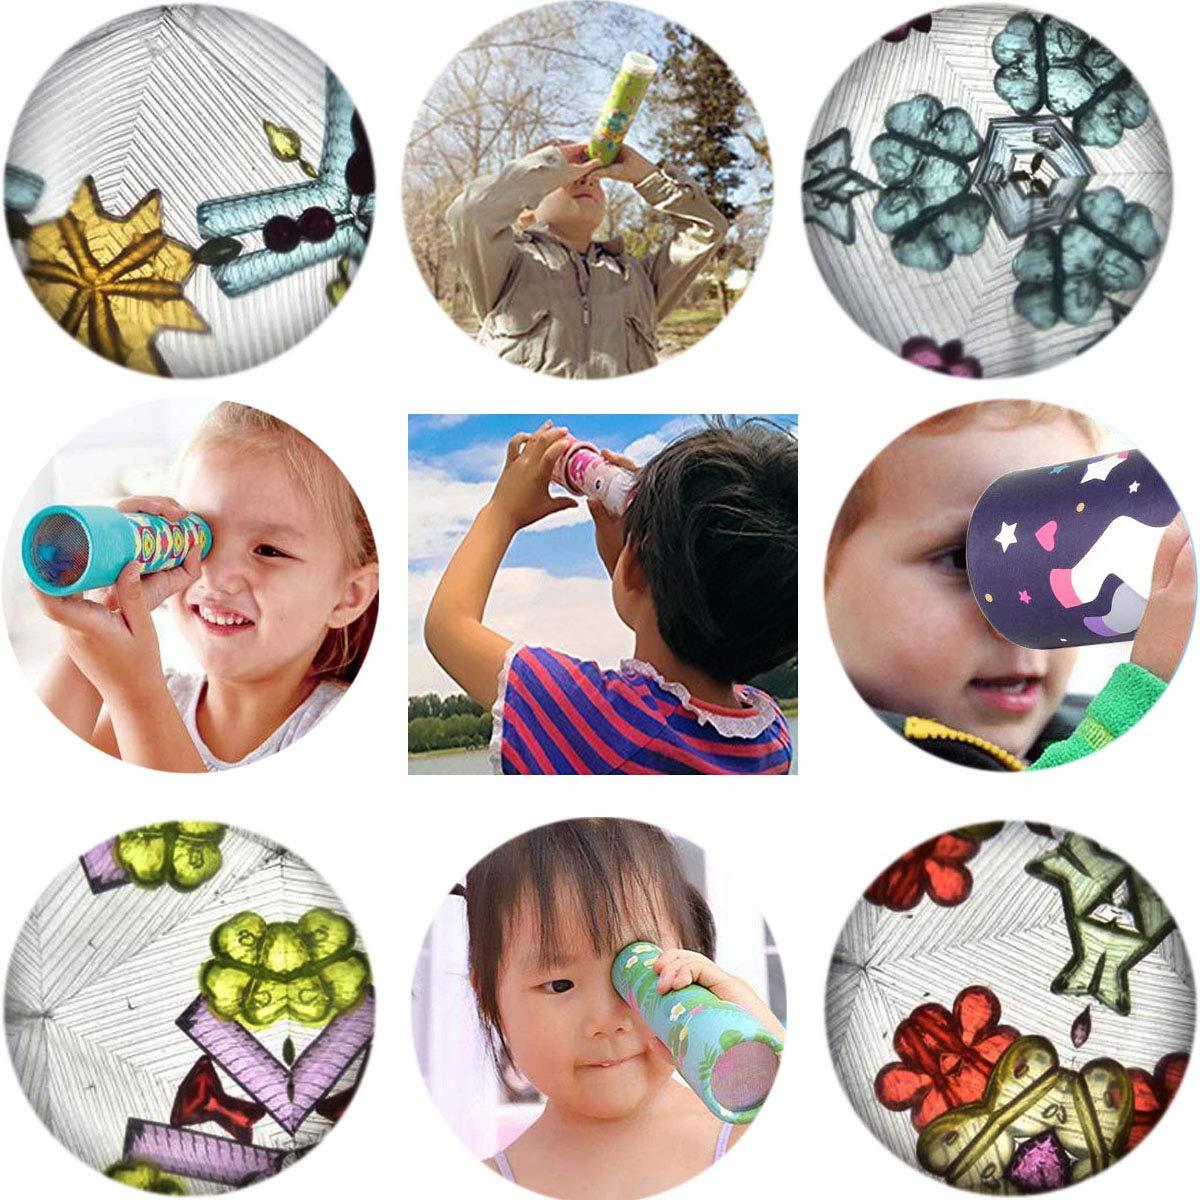 Osuter 6PCS Kaleidoskop Spielzeug Set Kaleidoscope Classic Lernspielzeug f/ür Kinder Erwachsener